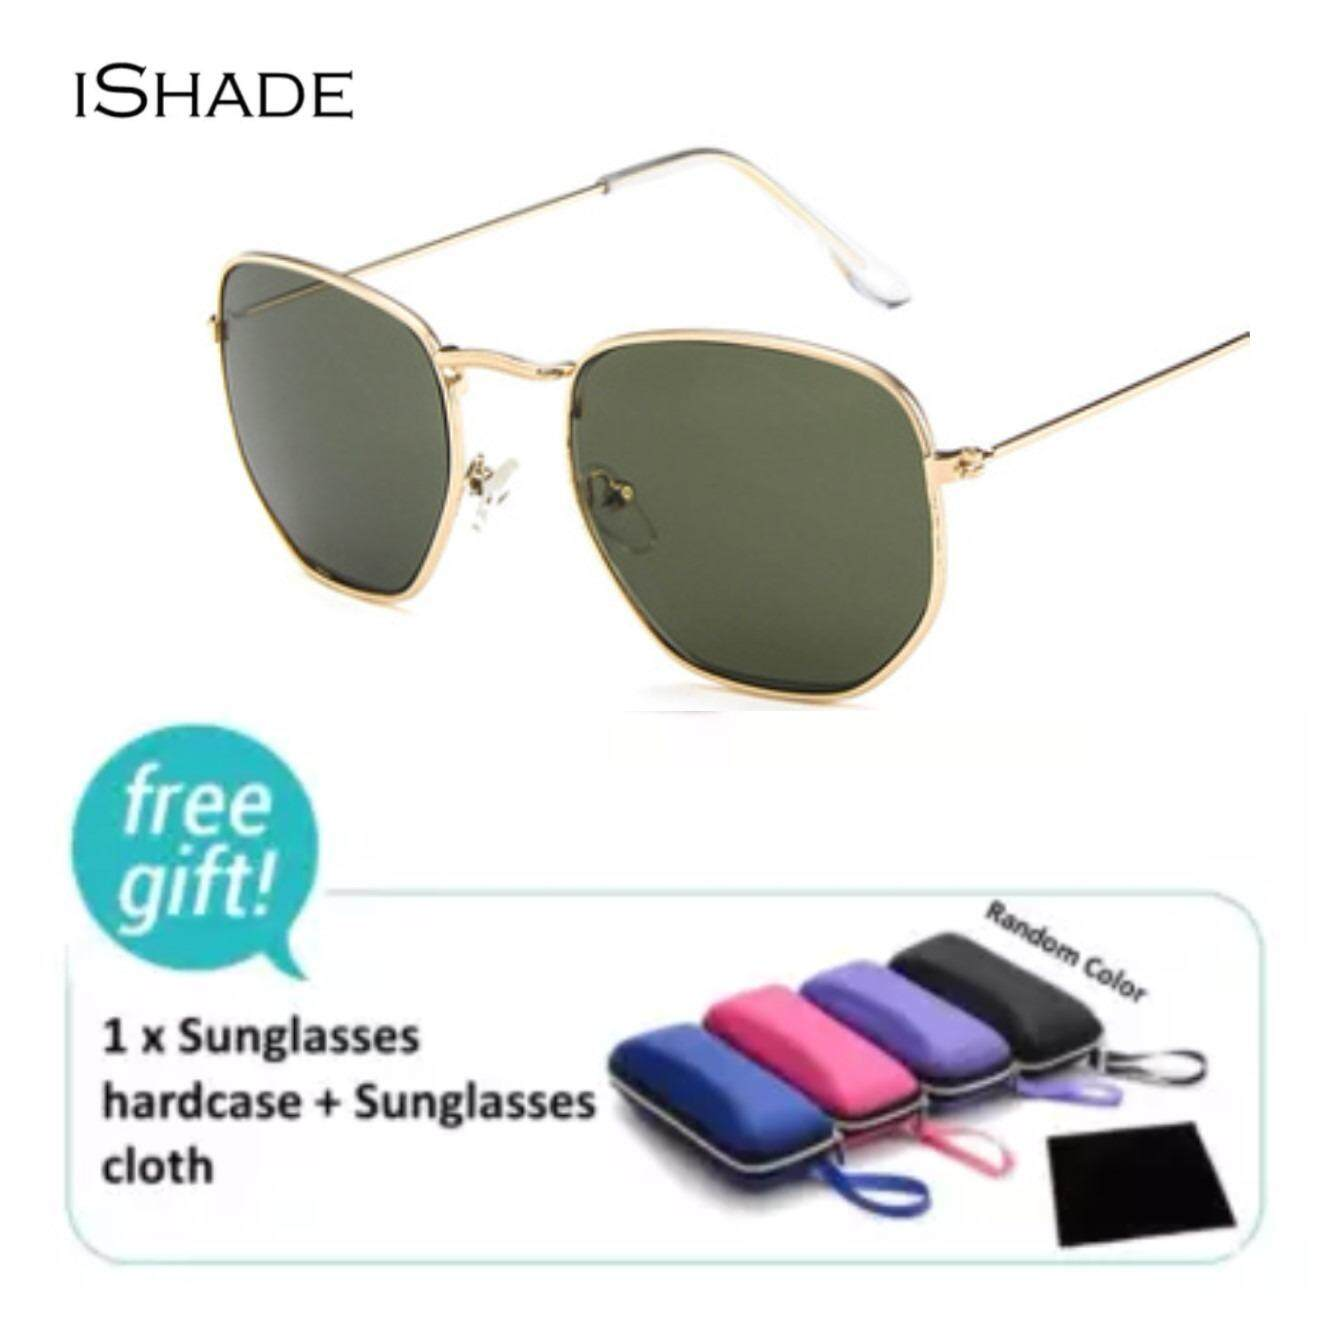 5080271f407 iShade Retro Fashion Metal Frame Sunglasses For Men And Women